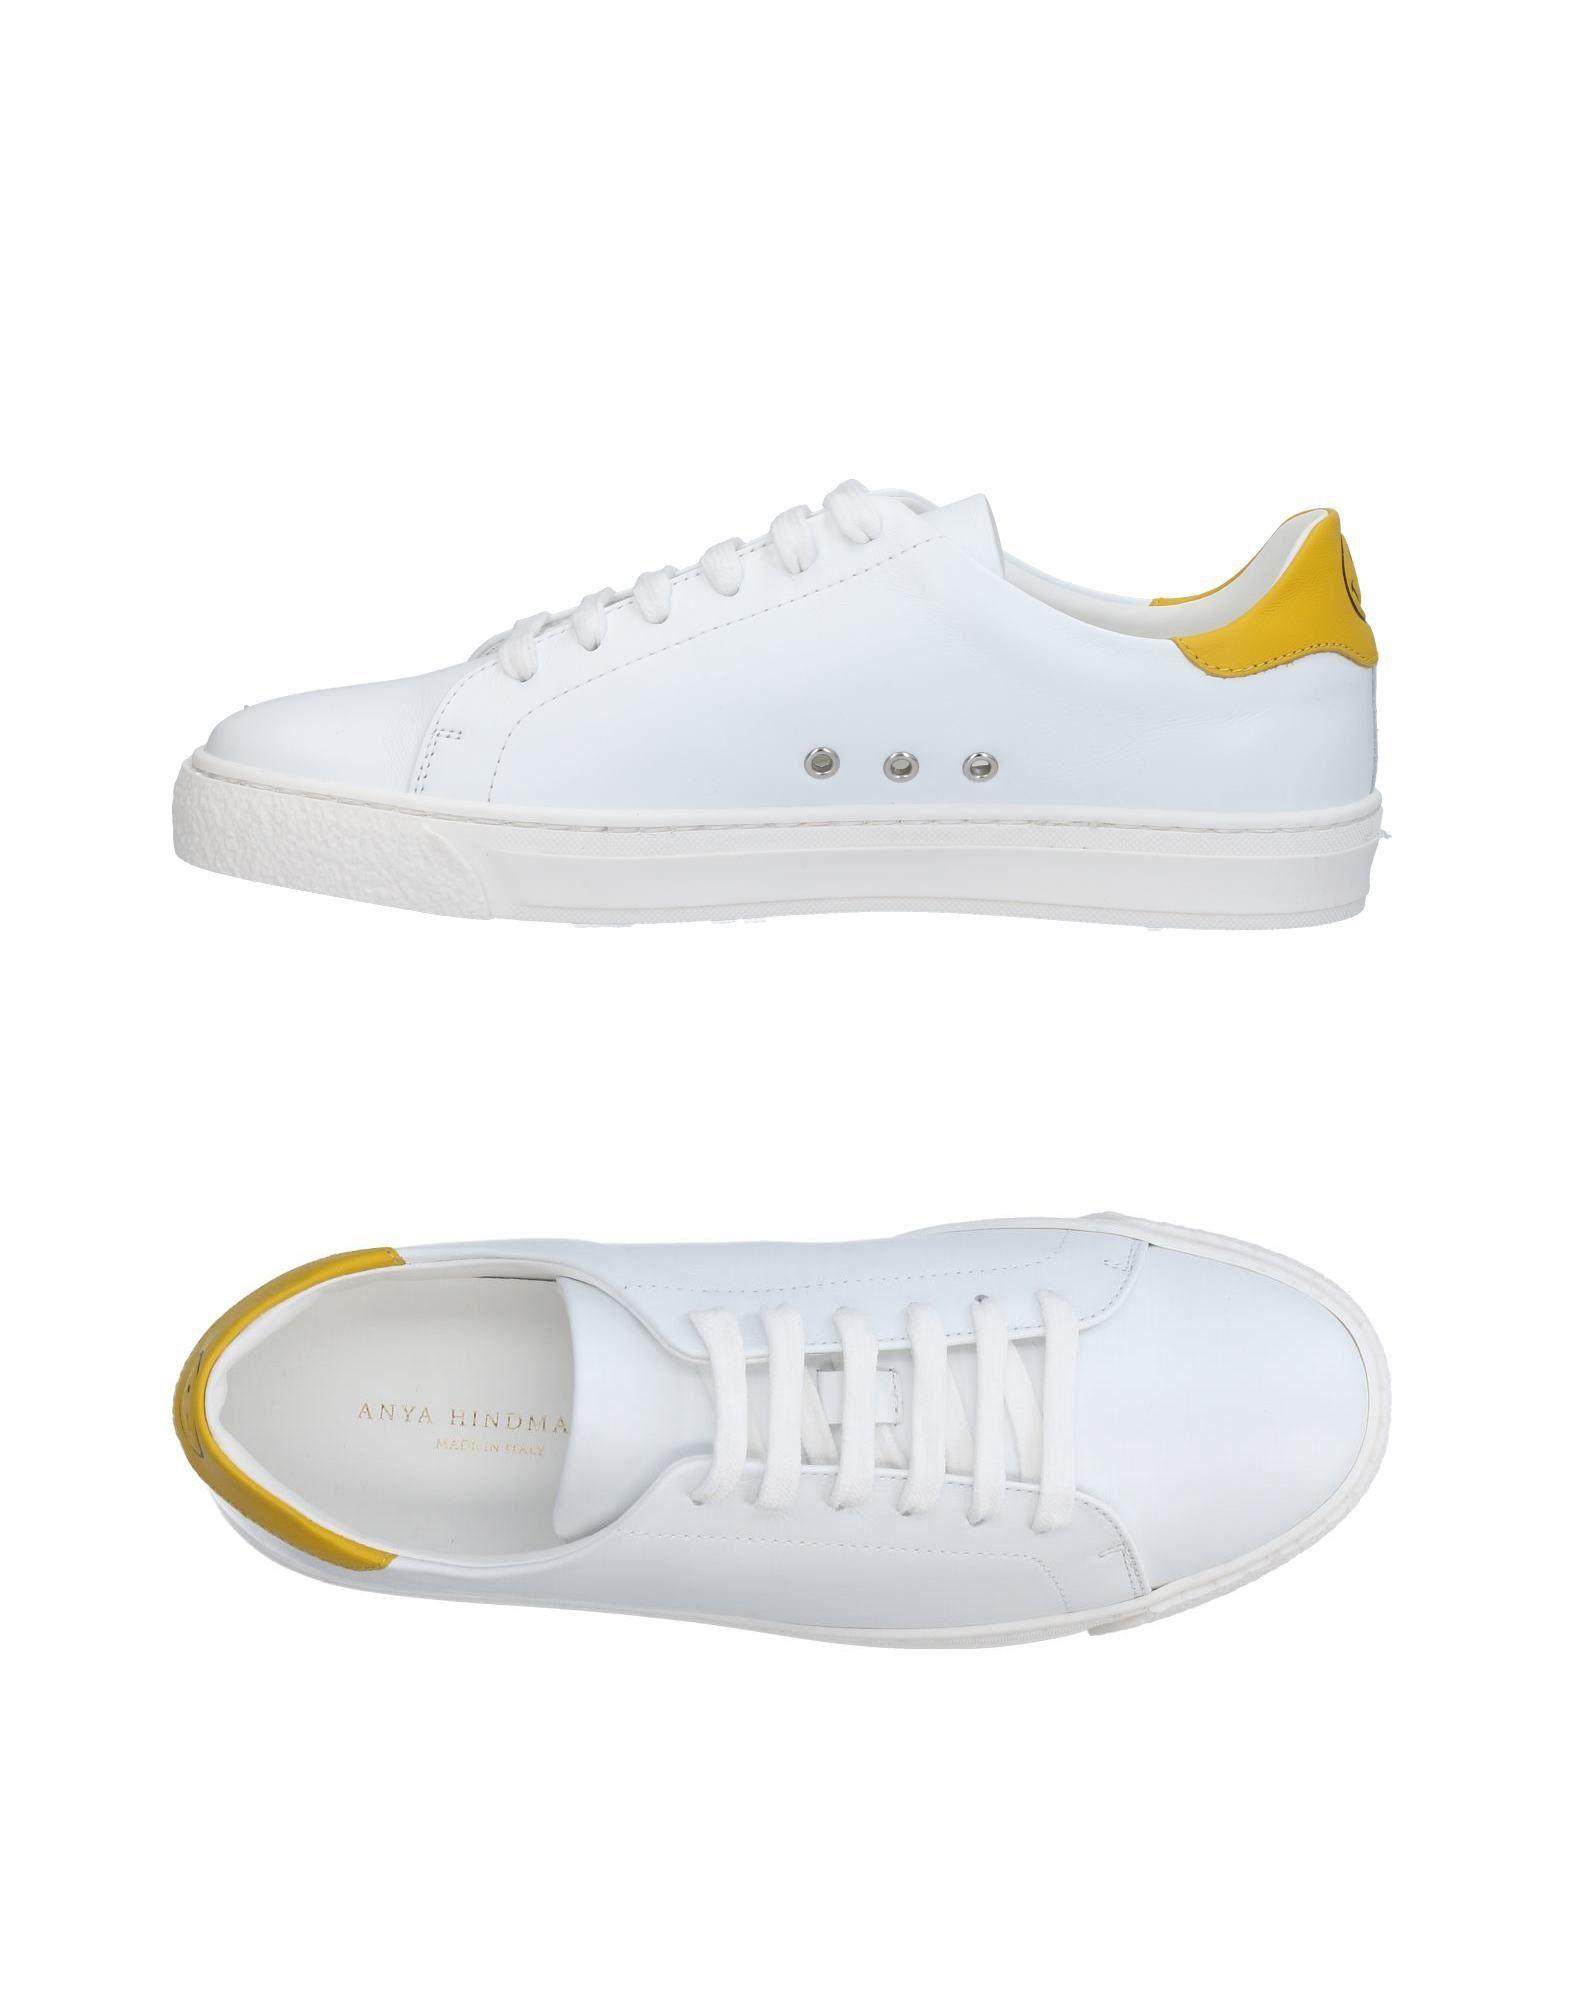 Anya Hindmarch Sneakers Damen  11461947RRGut aussehende strapazierfähige Schuhe